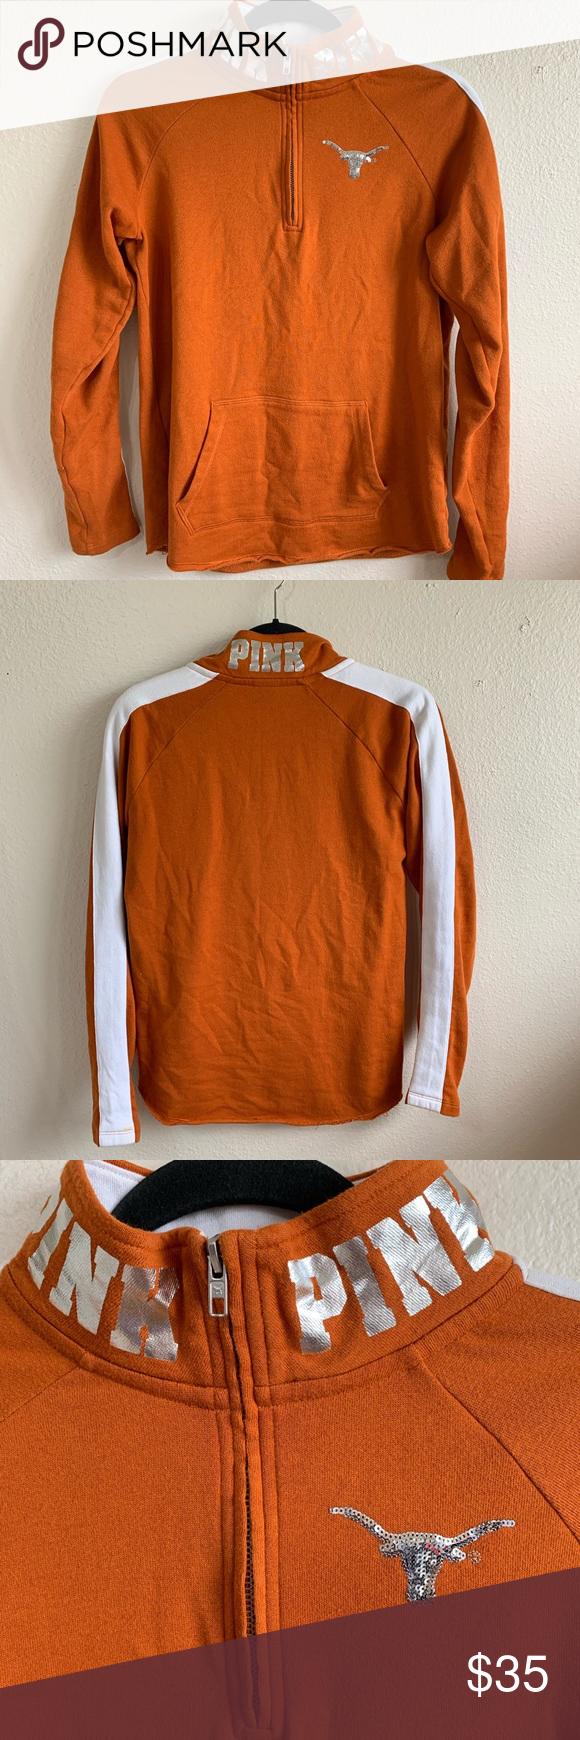 PINK longhorns UT zipper pull over sweater Sweaters